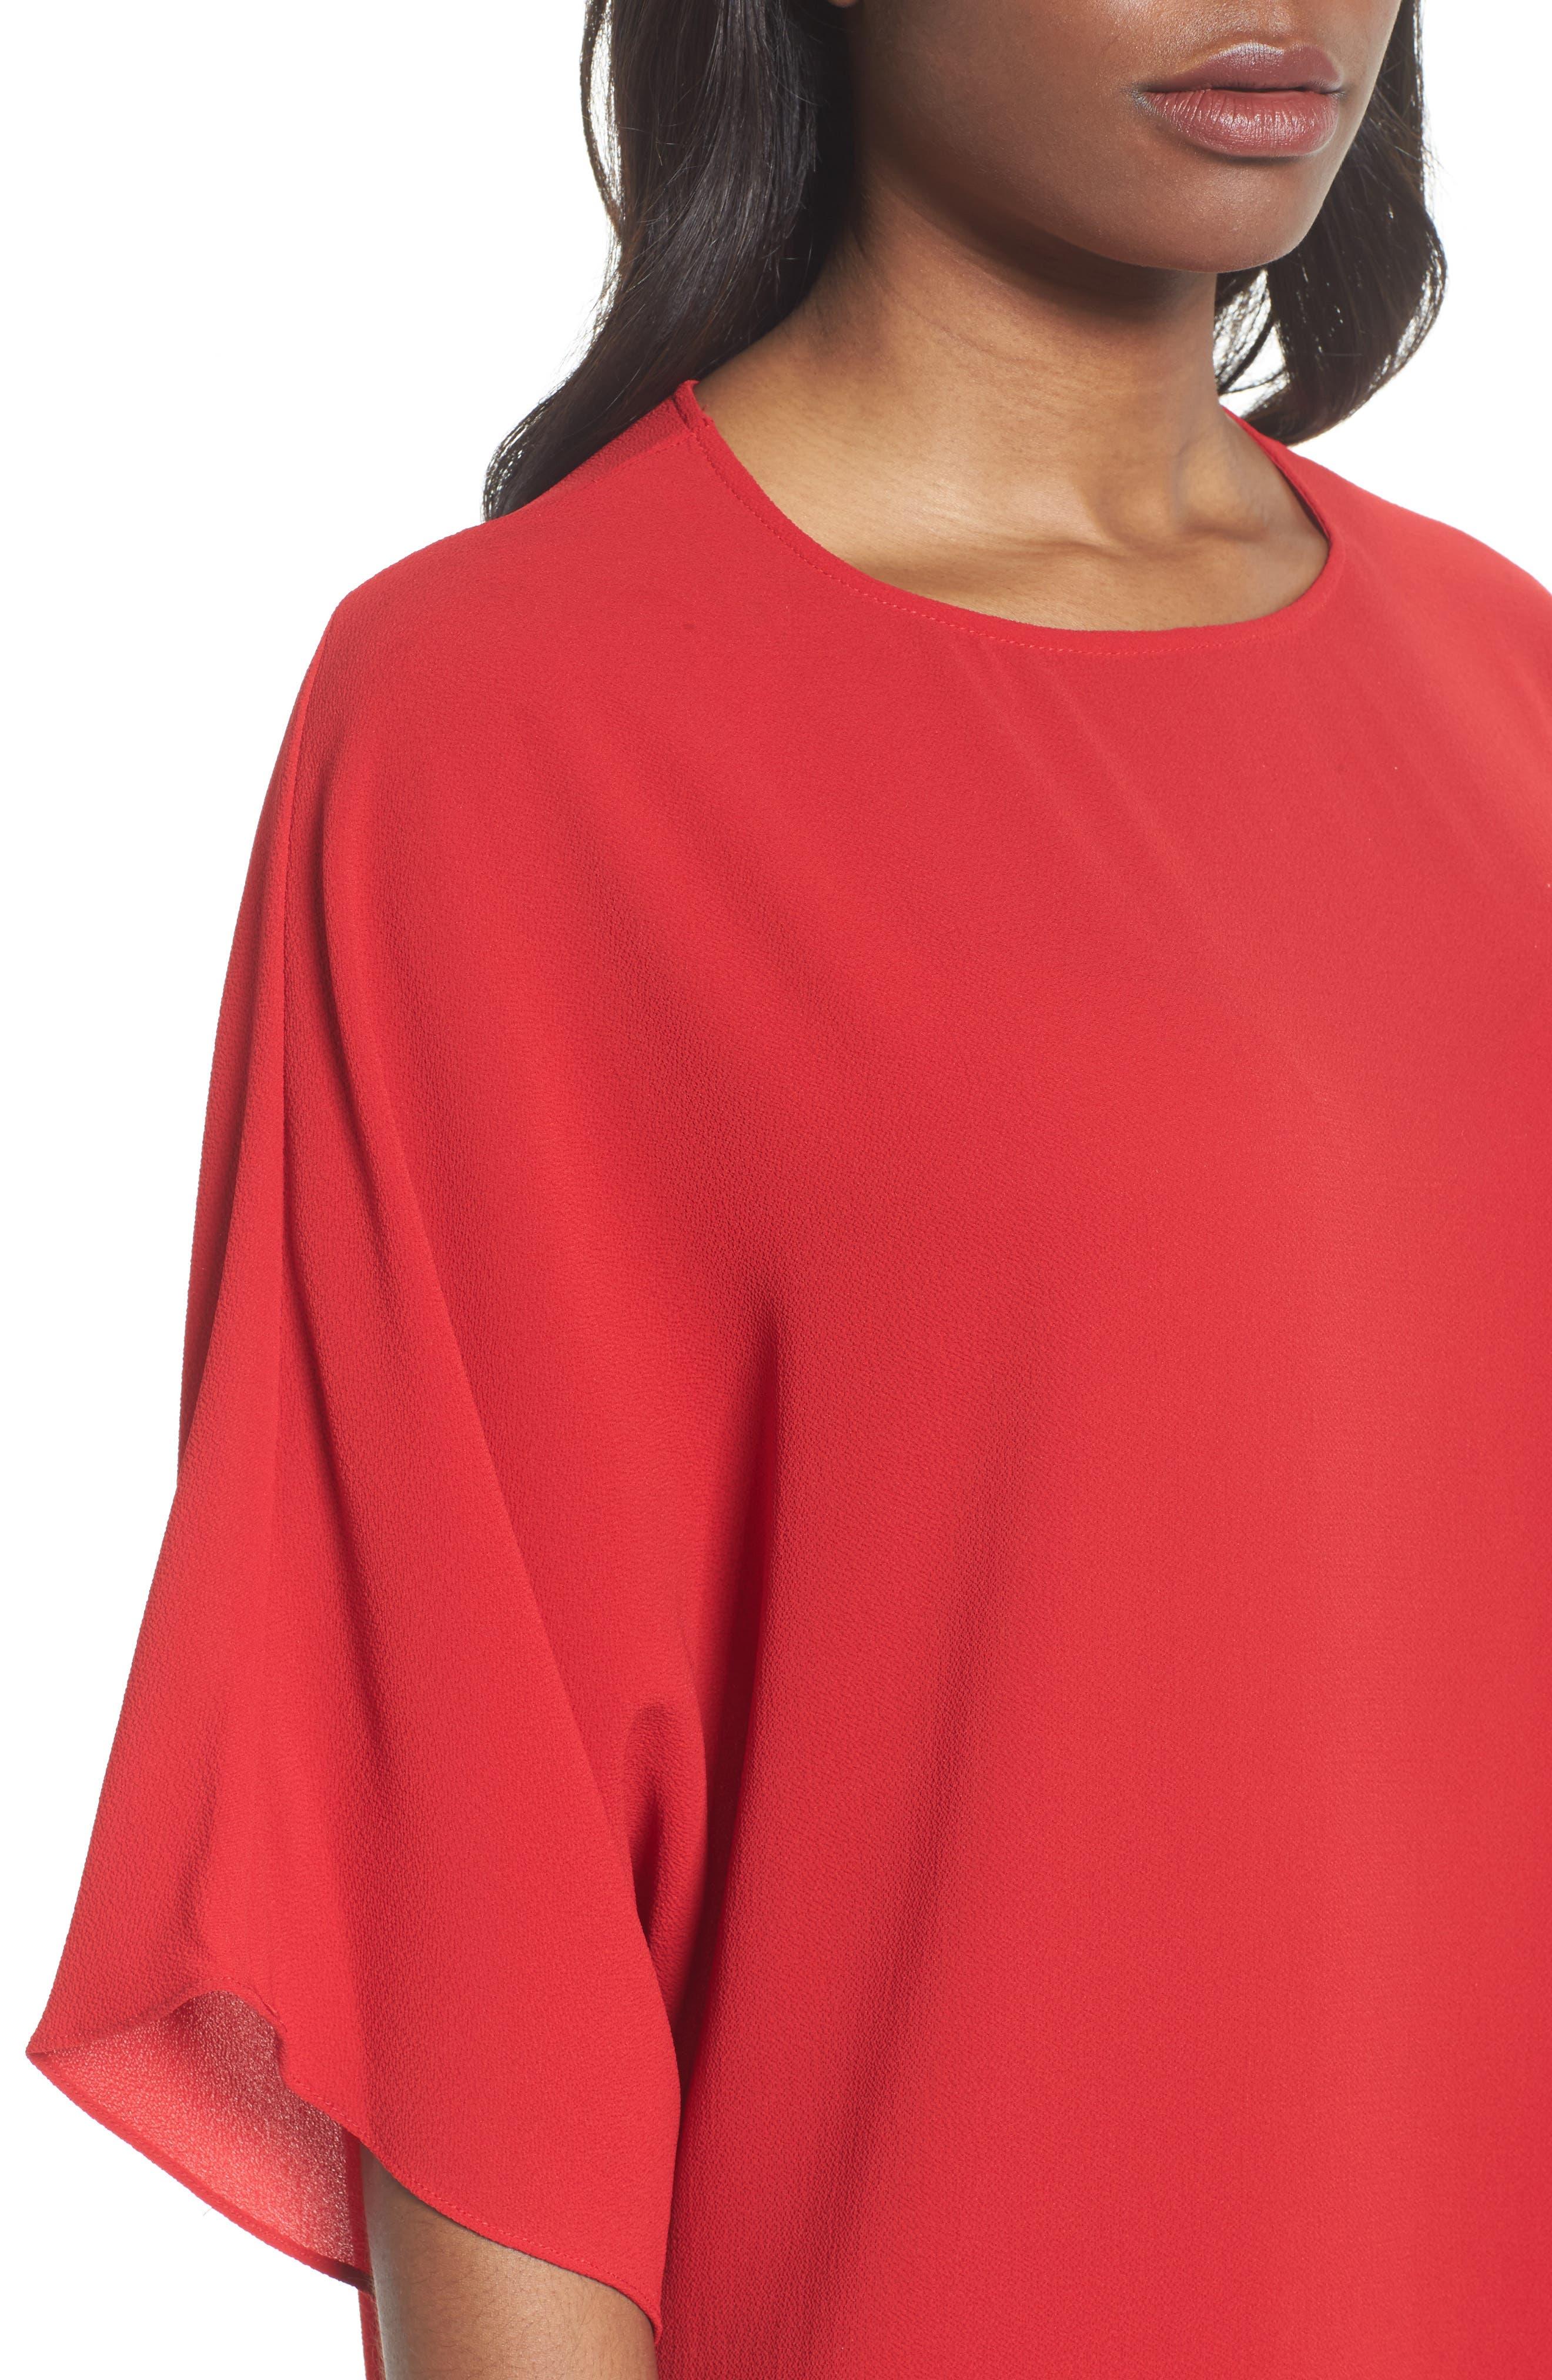 Dolman Sleeve Dress,                             Alternate thumbnail 4, color,                             614